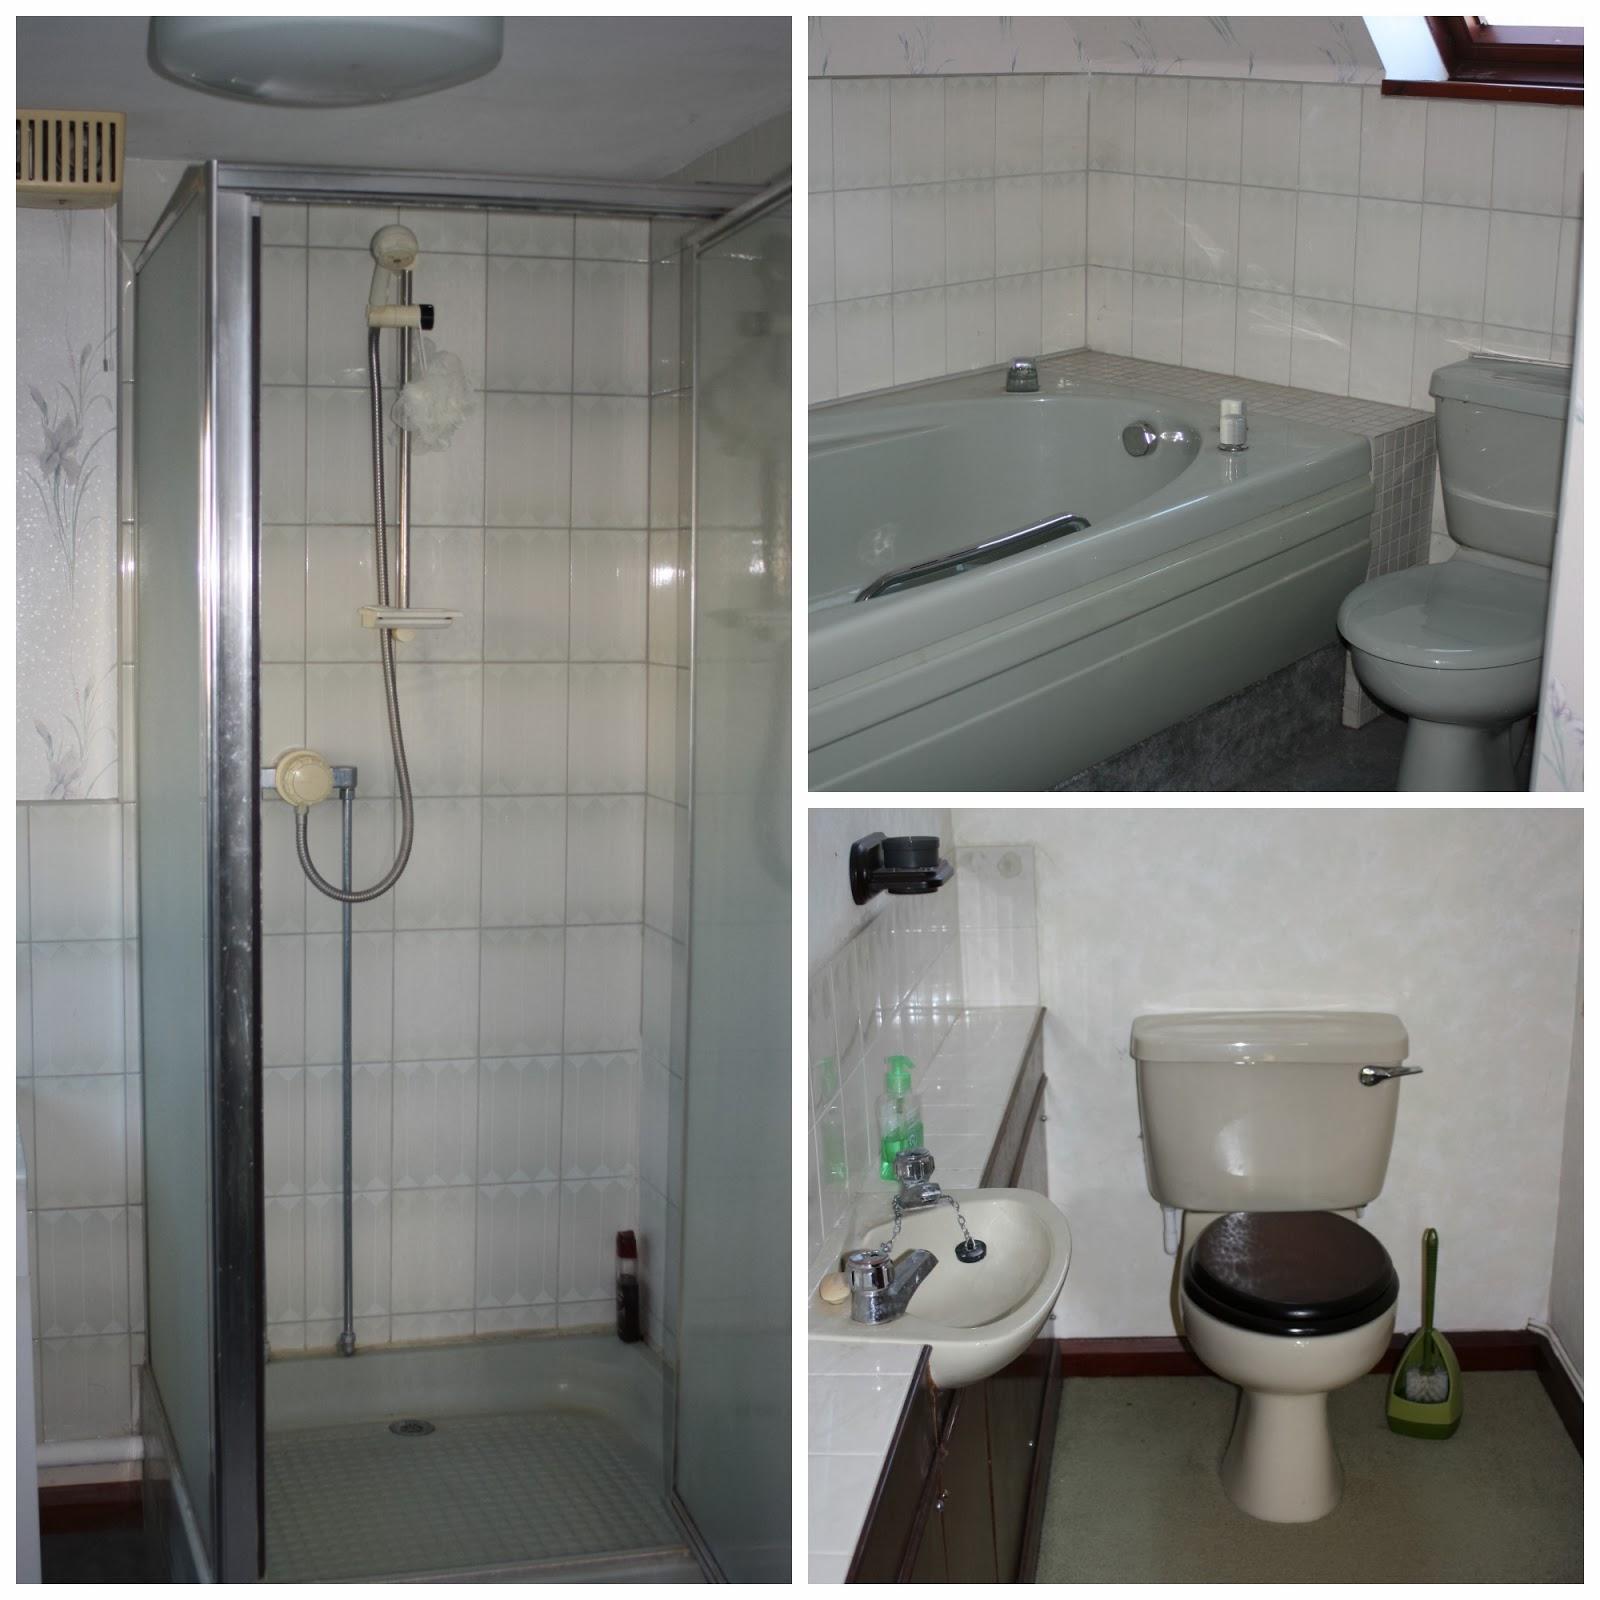 Bathroom-shower-toilet-bath